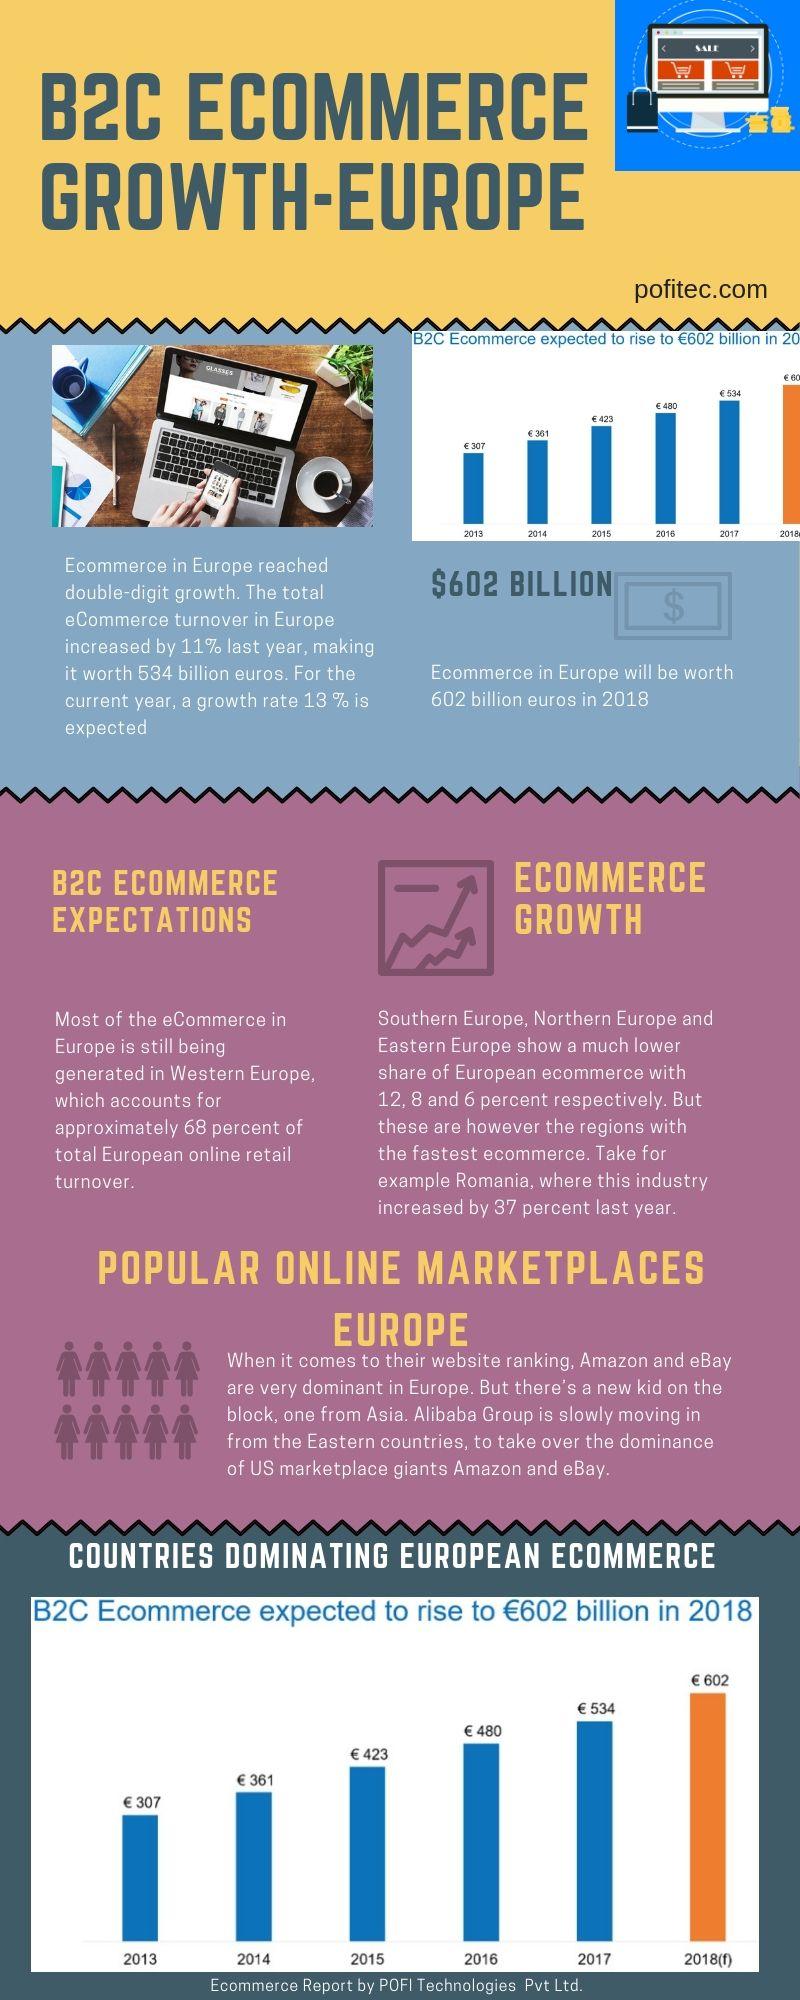 B2C Marketplace Online food, Order food, Open